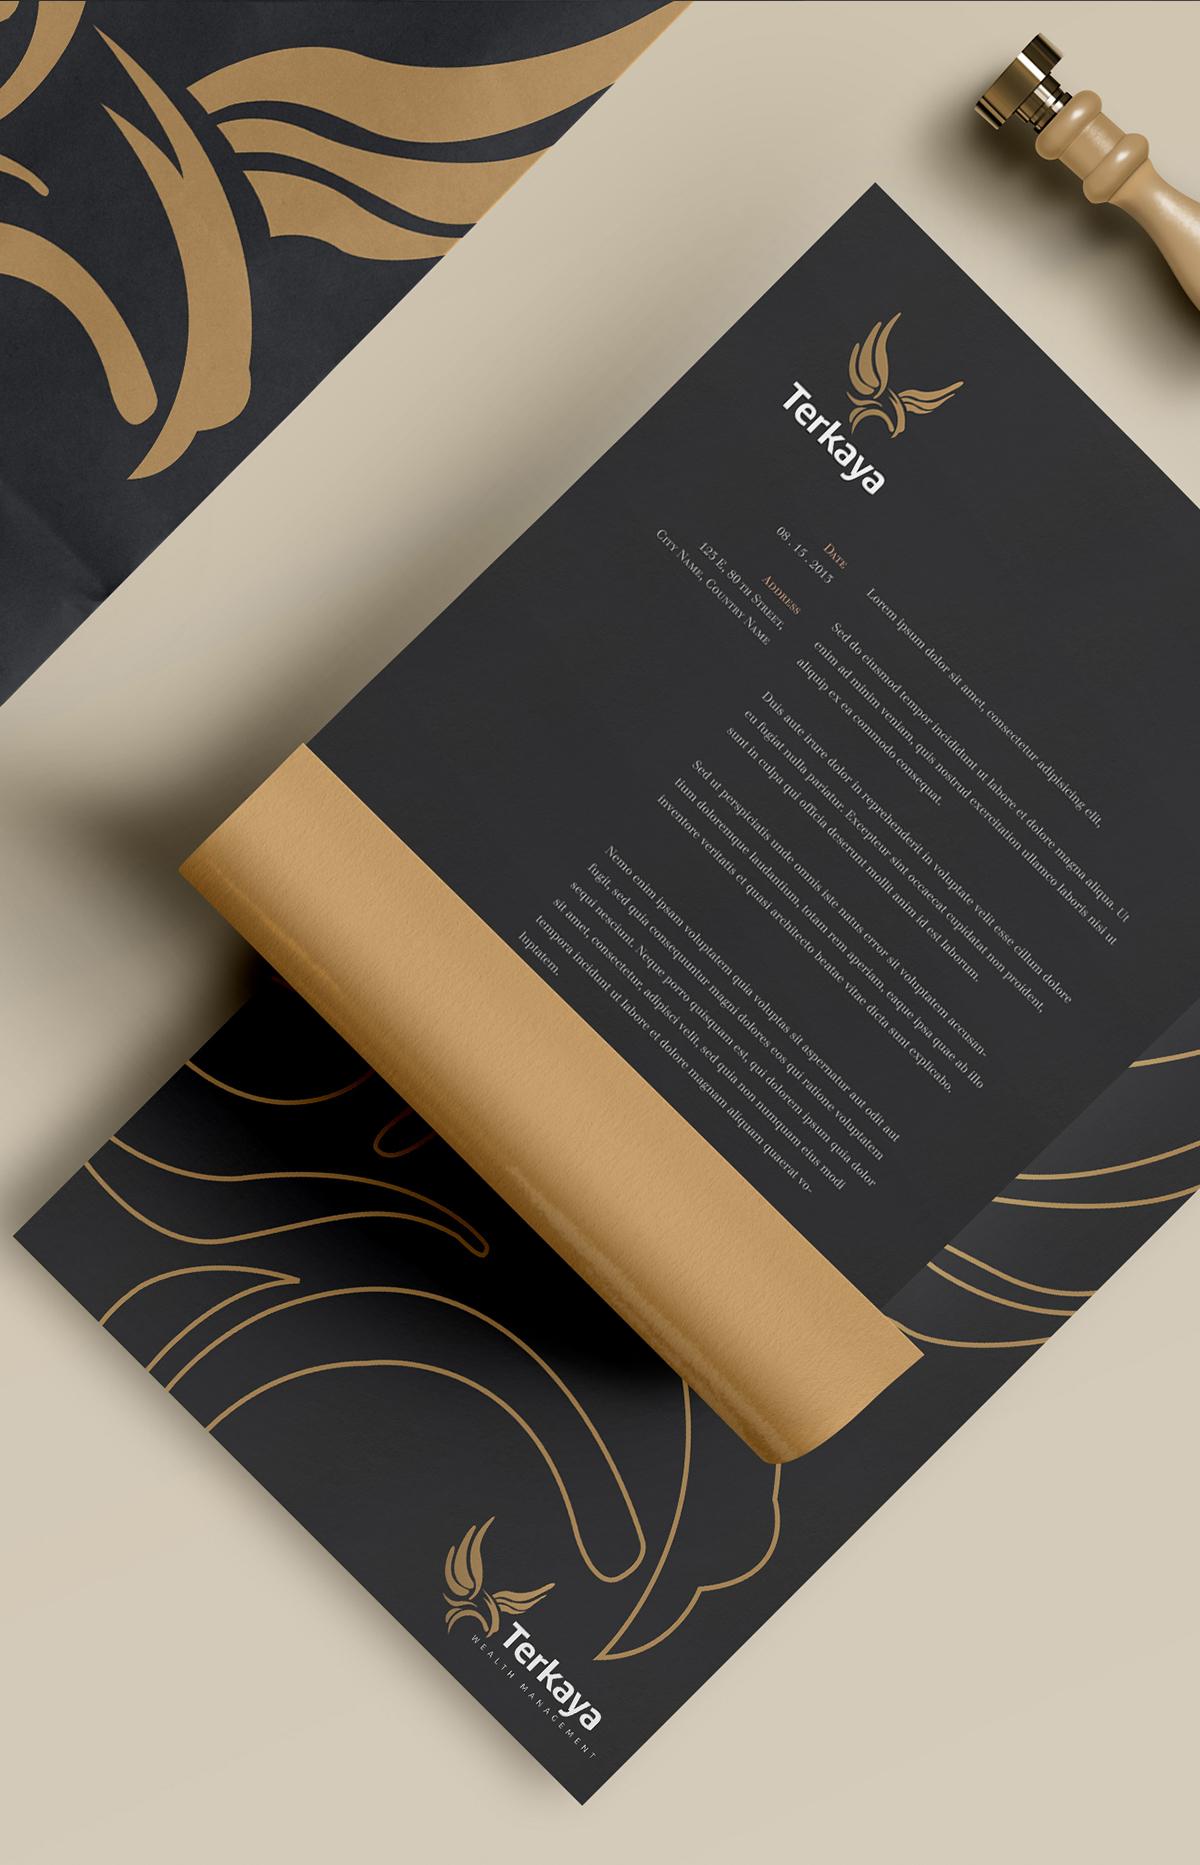 Проект брендинга для компании